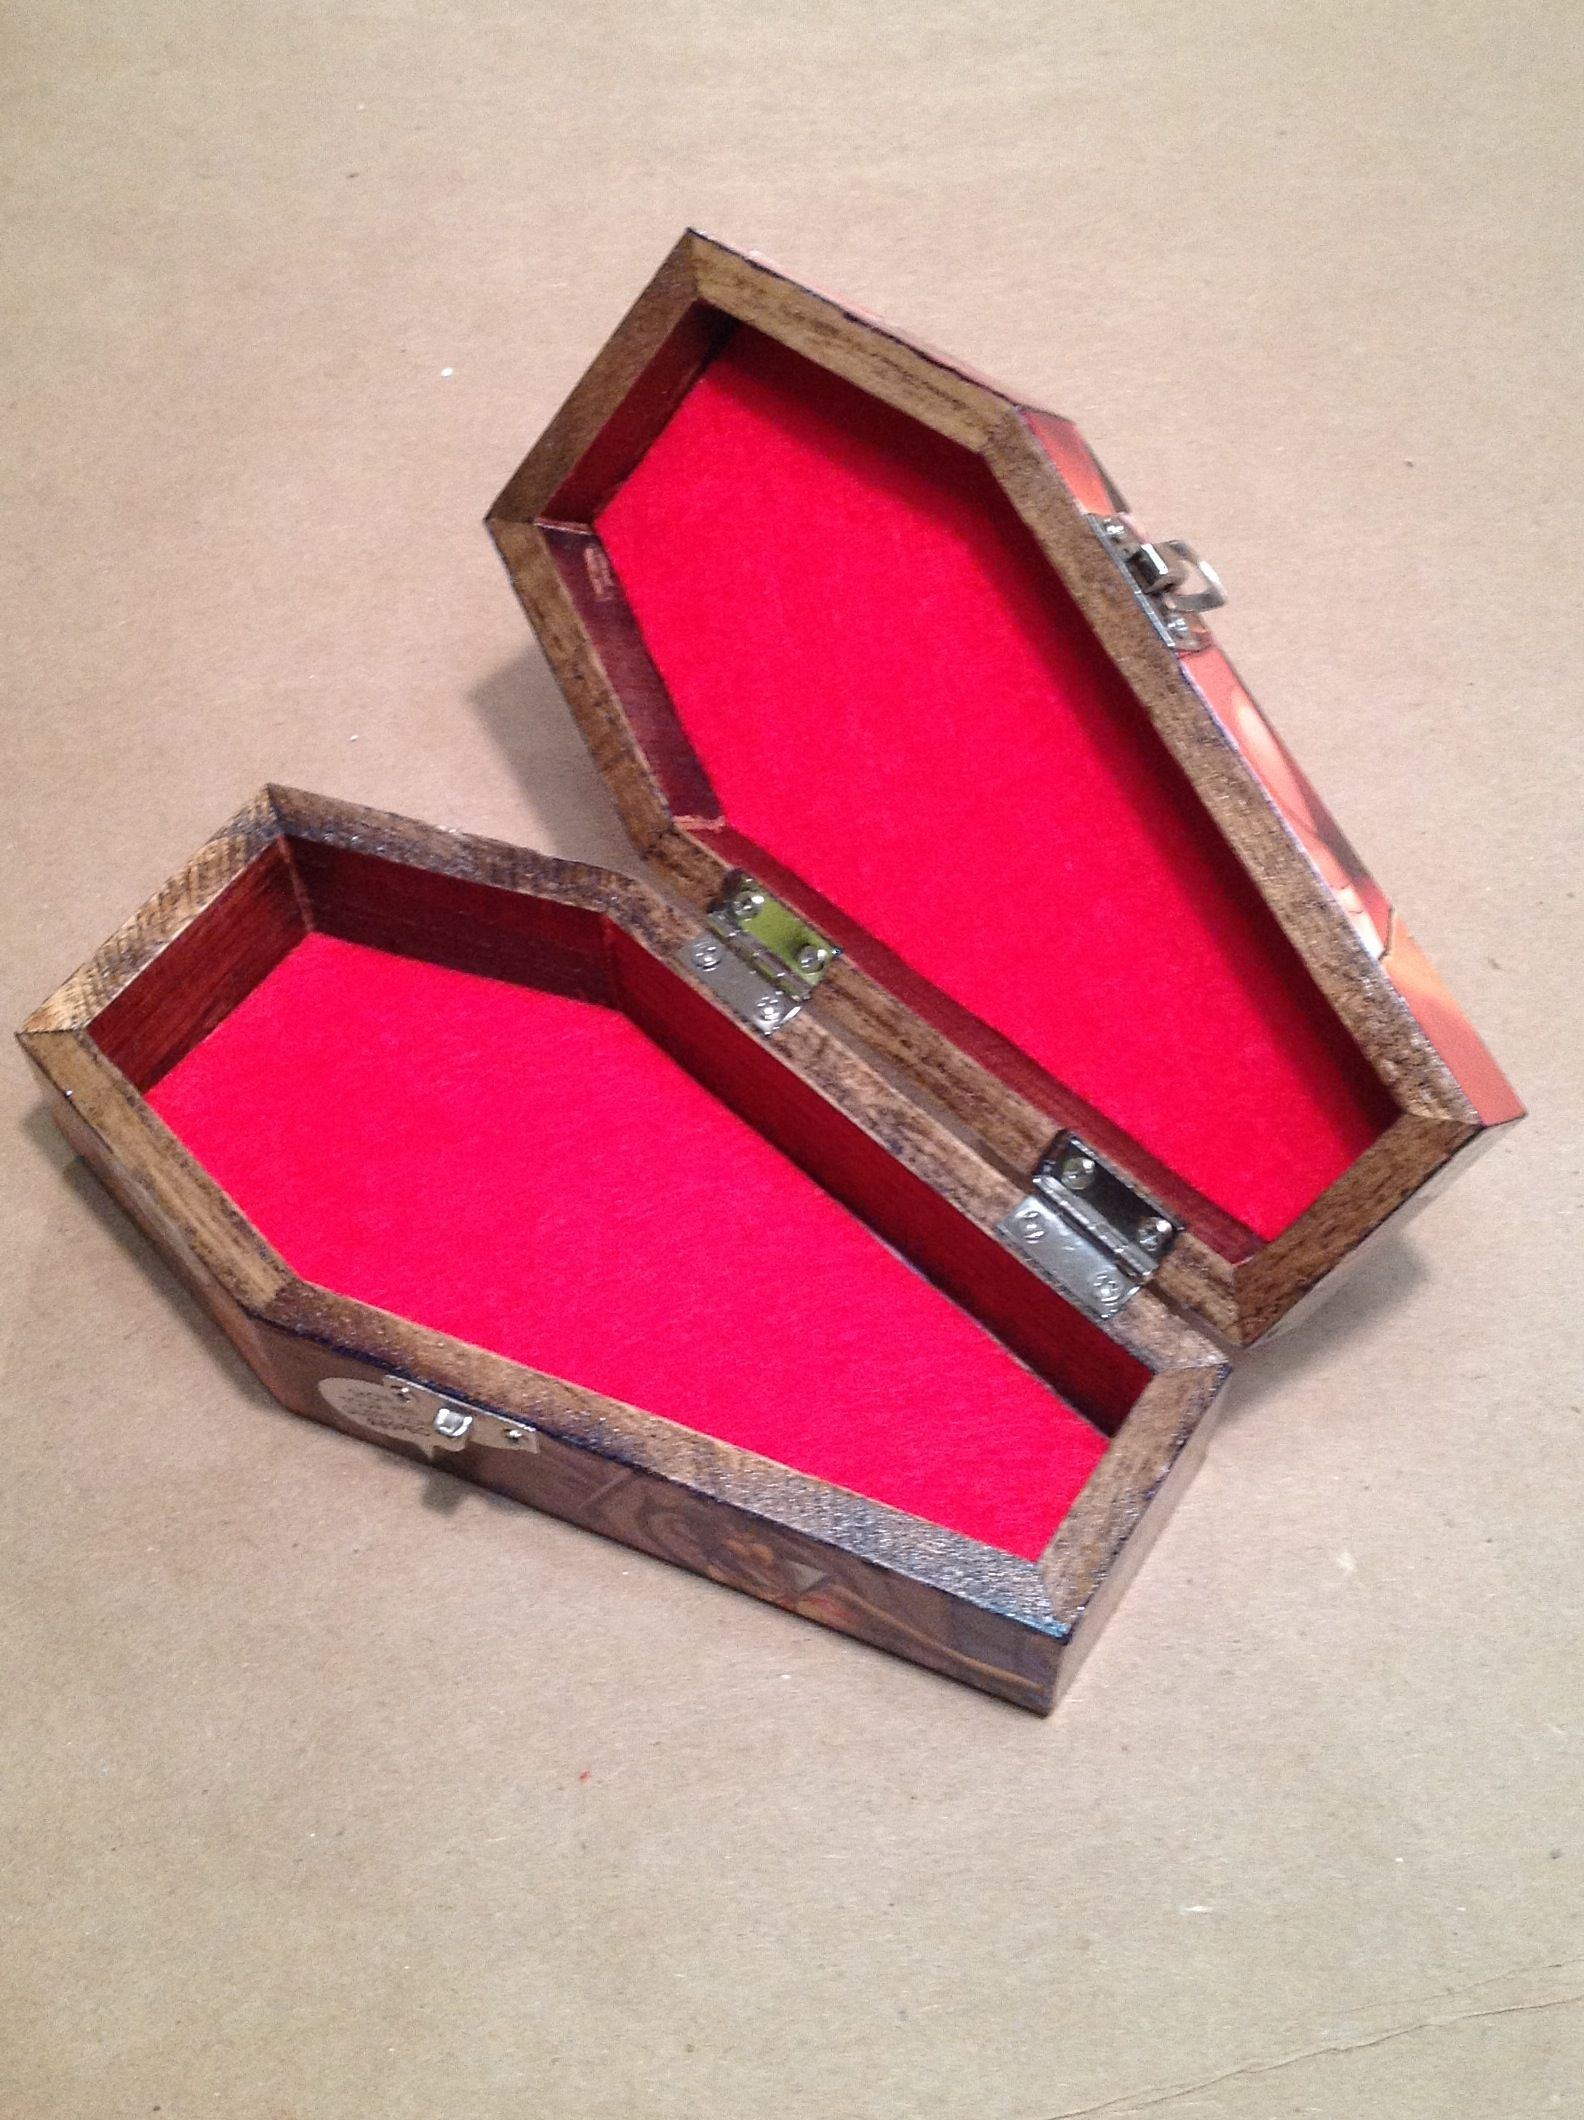 Vampirella Comic Coffin Jewelry Box Now listed hyperartisthotmail